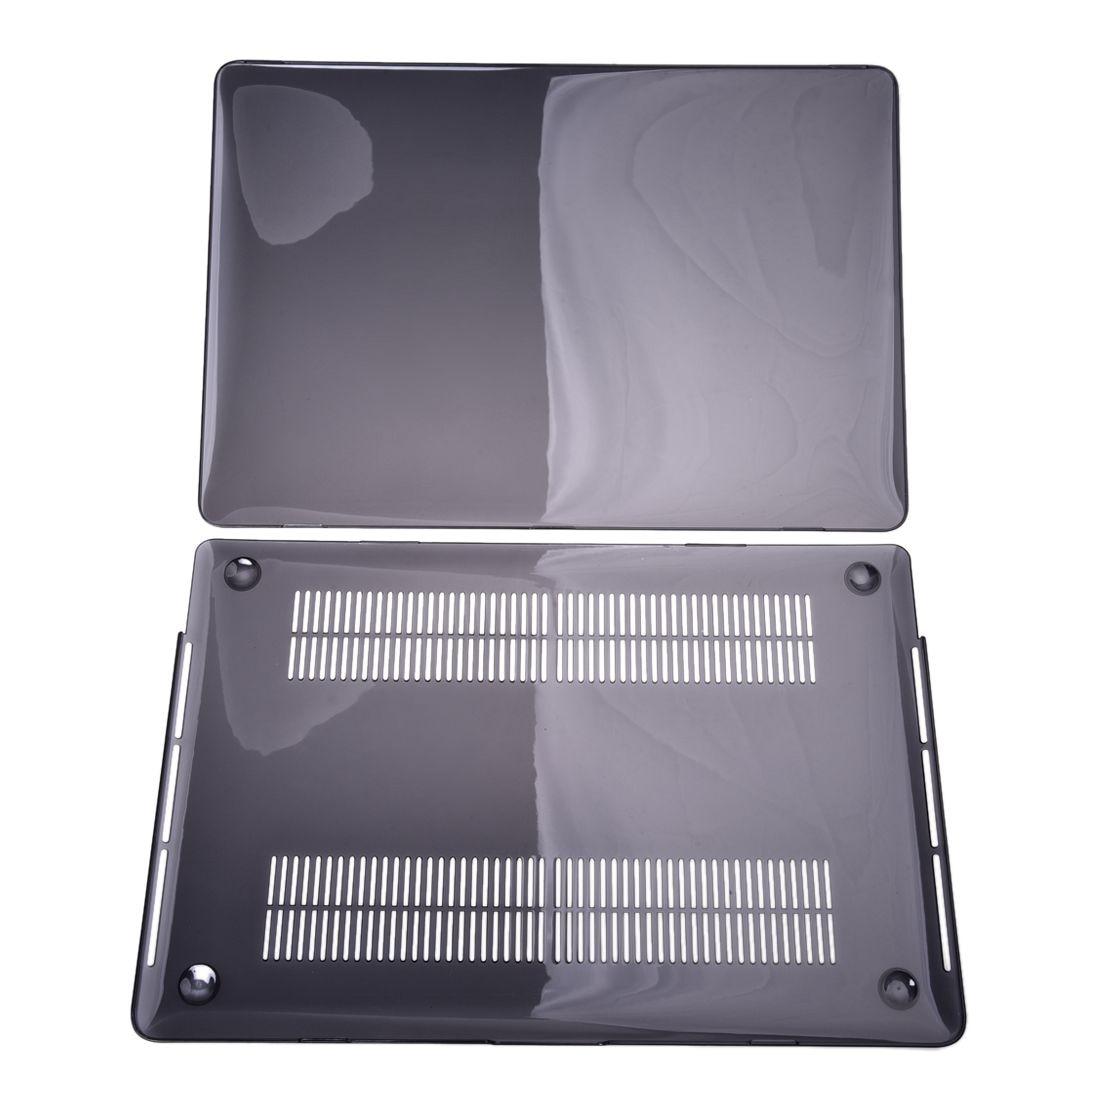 Crystal Hard Case For Apple Macbook Laptop Cover Retina 15 Inch Black